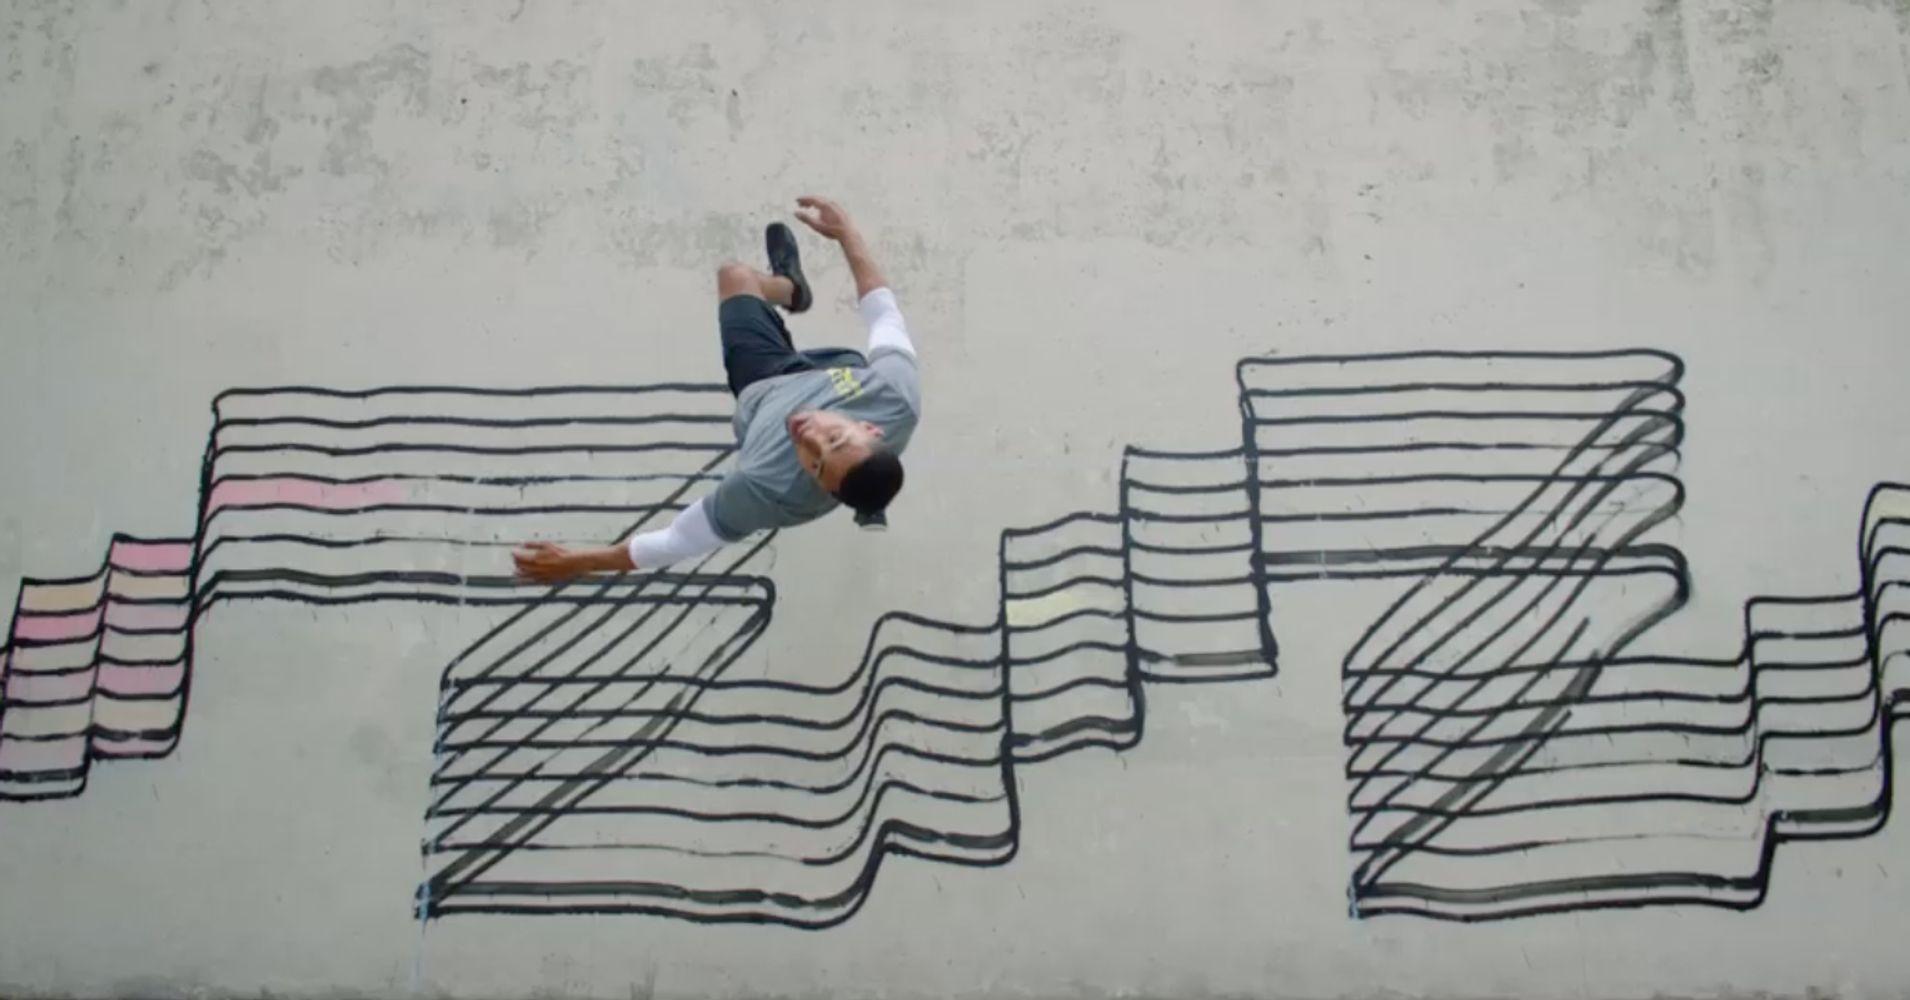 Image result for h&m street art lawsuit